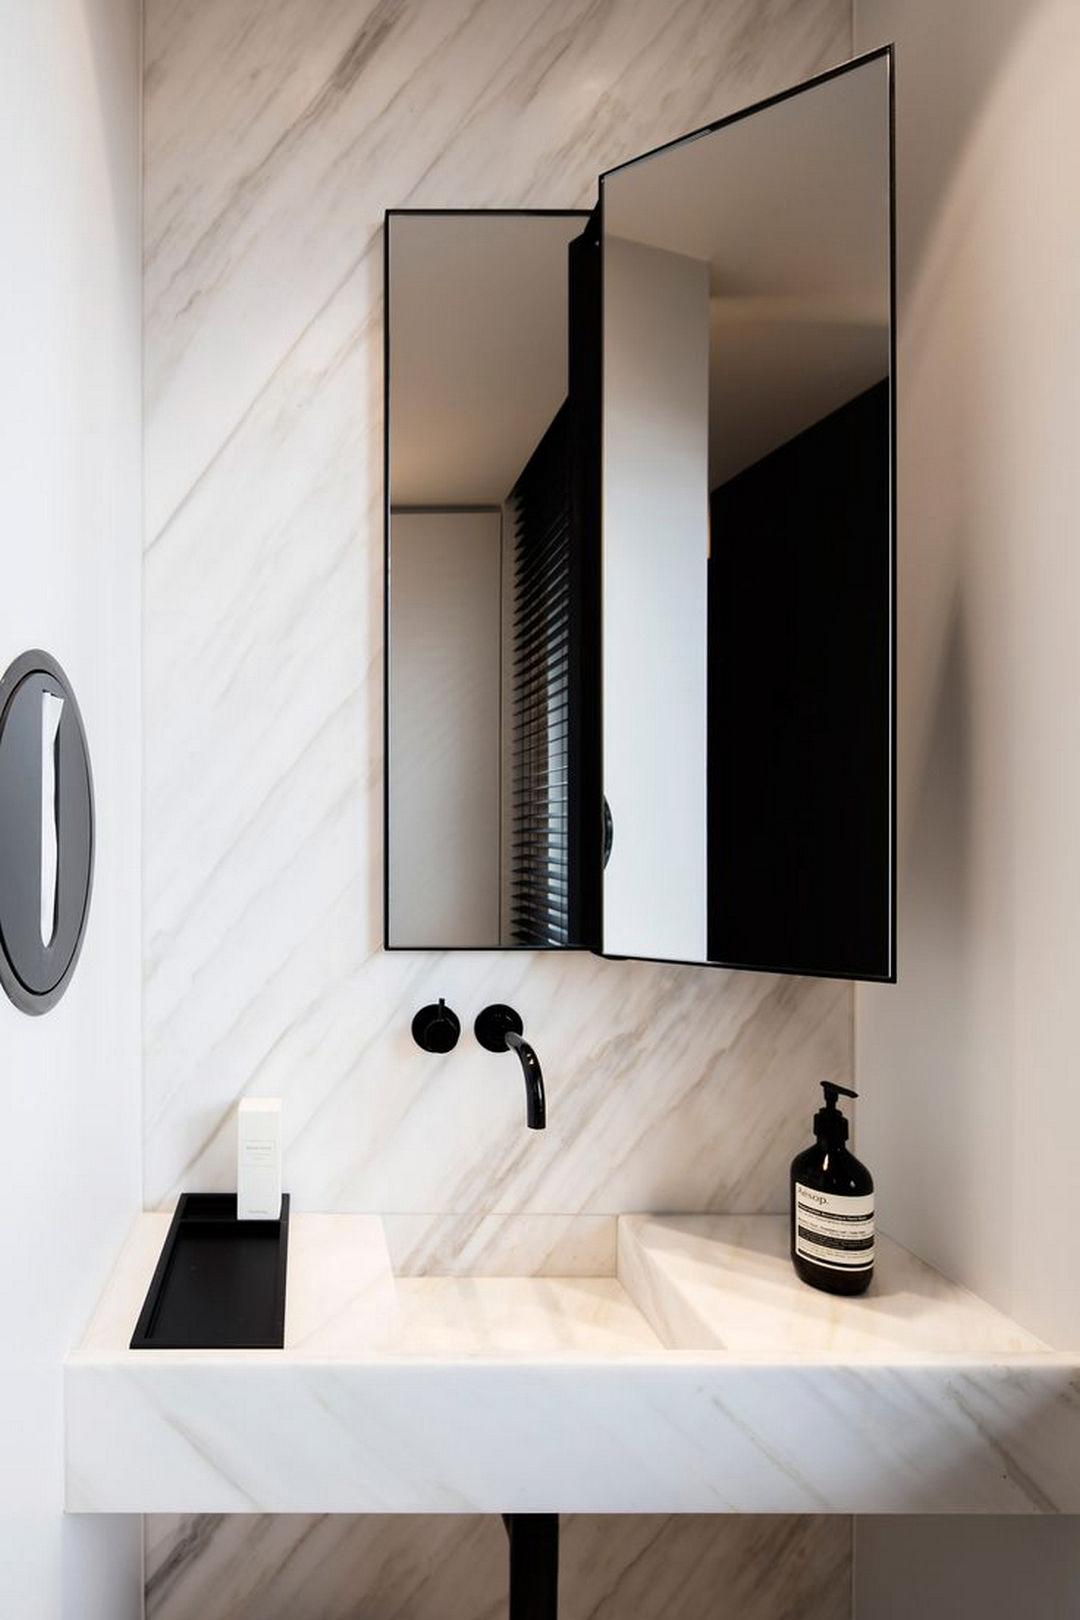 Modern Bathroom Interior Designs 100 Fascinating Photos Home - Bathroom-interior-design